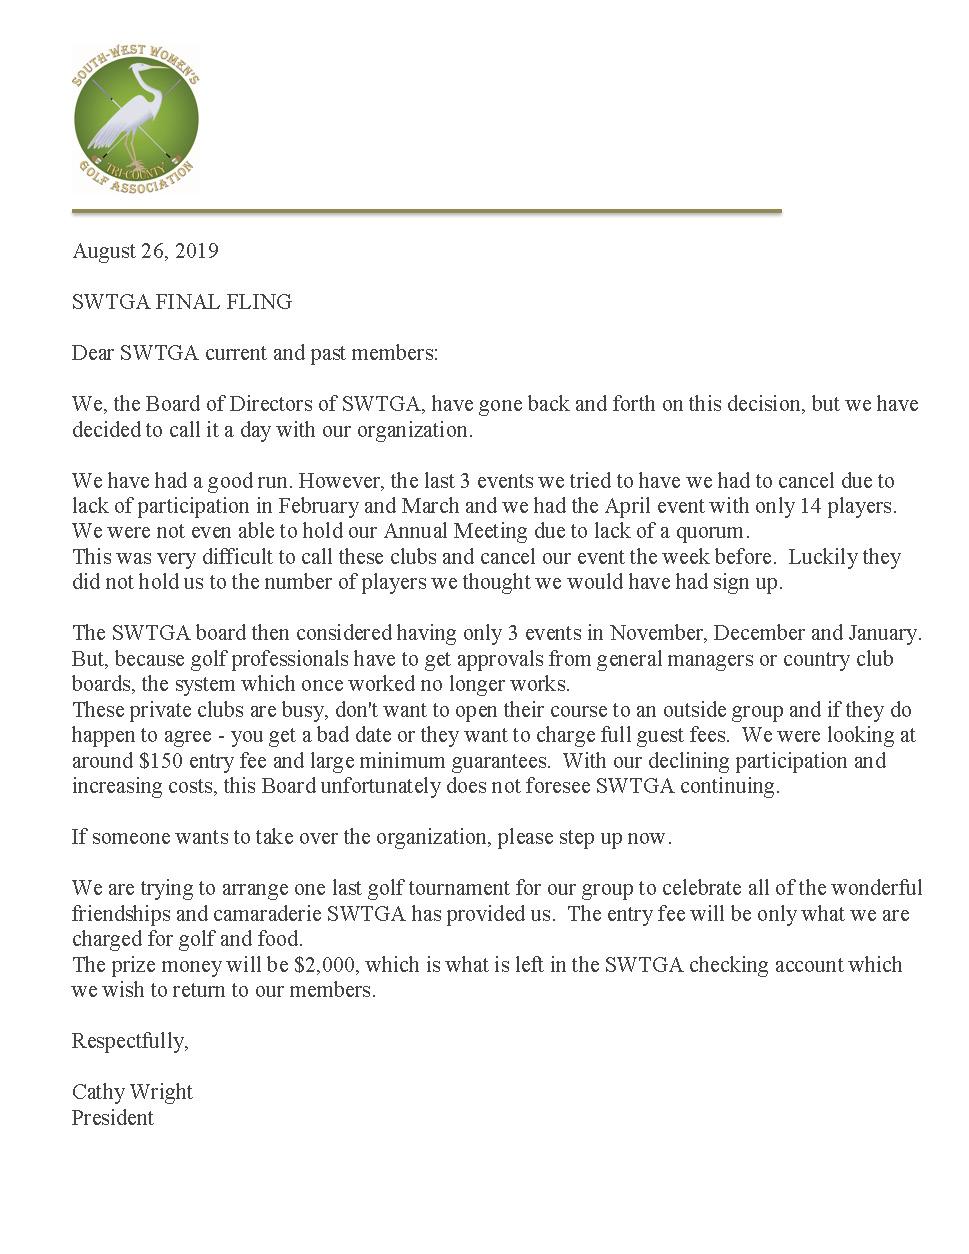 SWTGA 2019 FINAL Pres letter 2.jpg